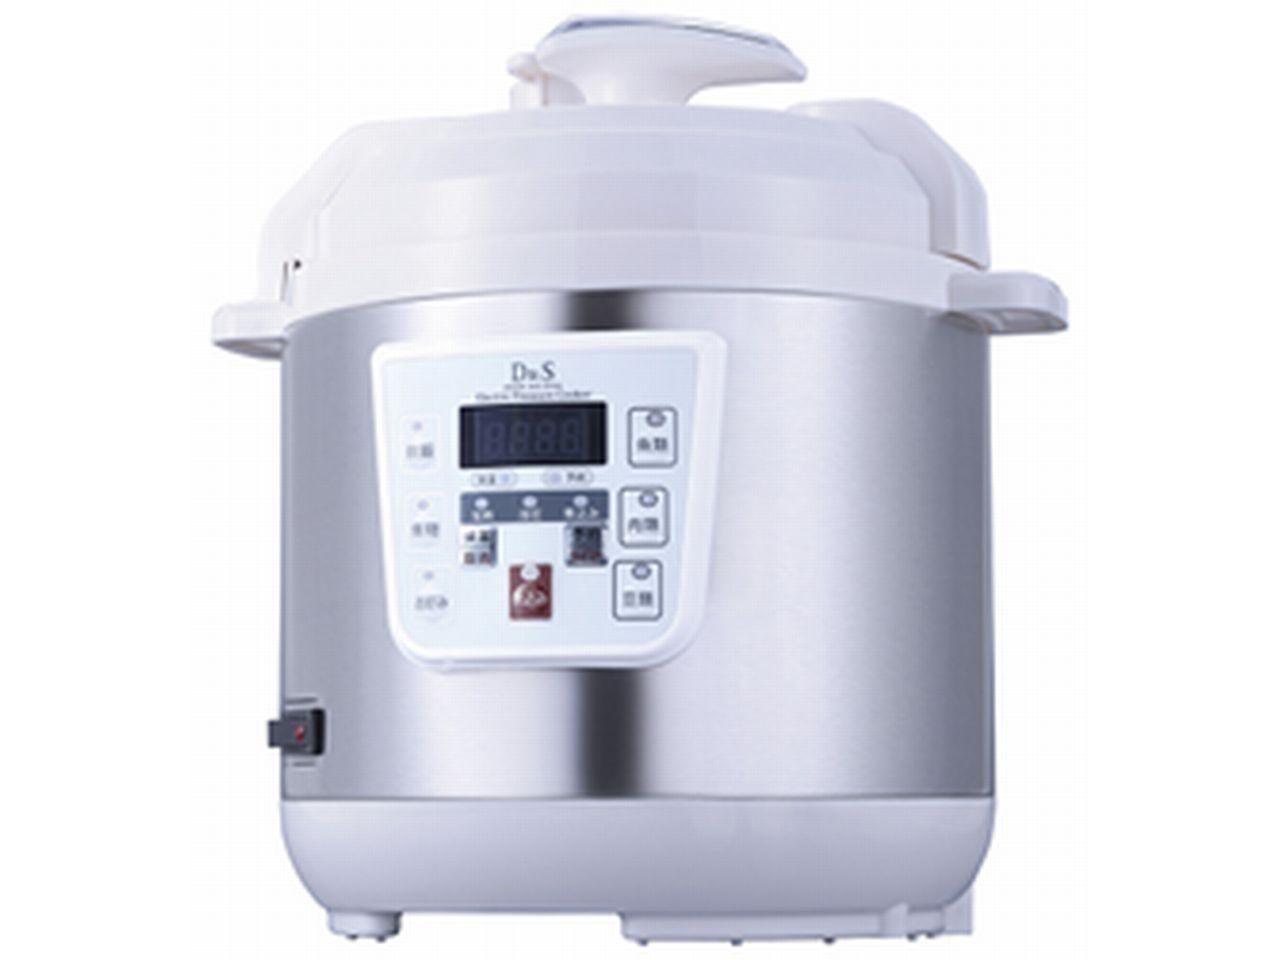 D&S マイコン電気圧力鍋 STLEC30